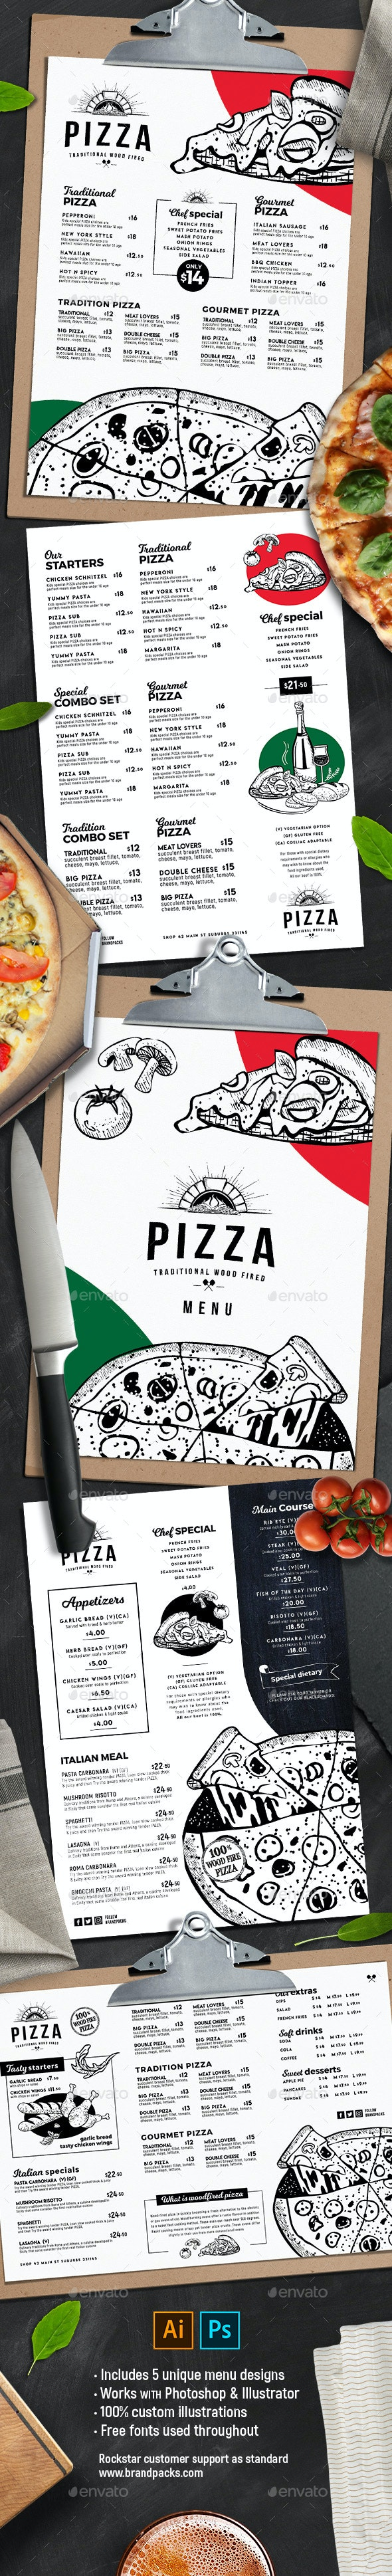 Pizza Menu Templates - Food Menus Print Templates